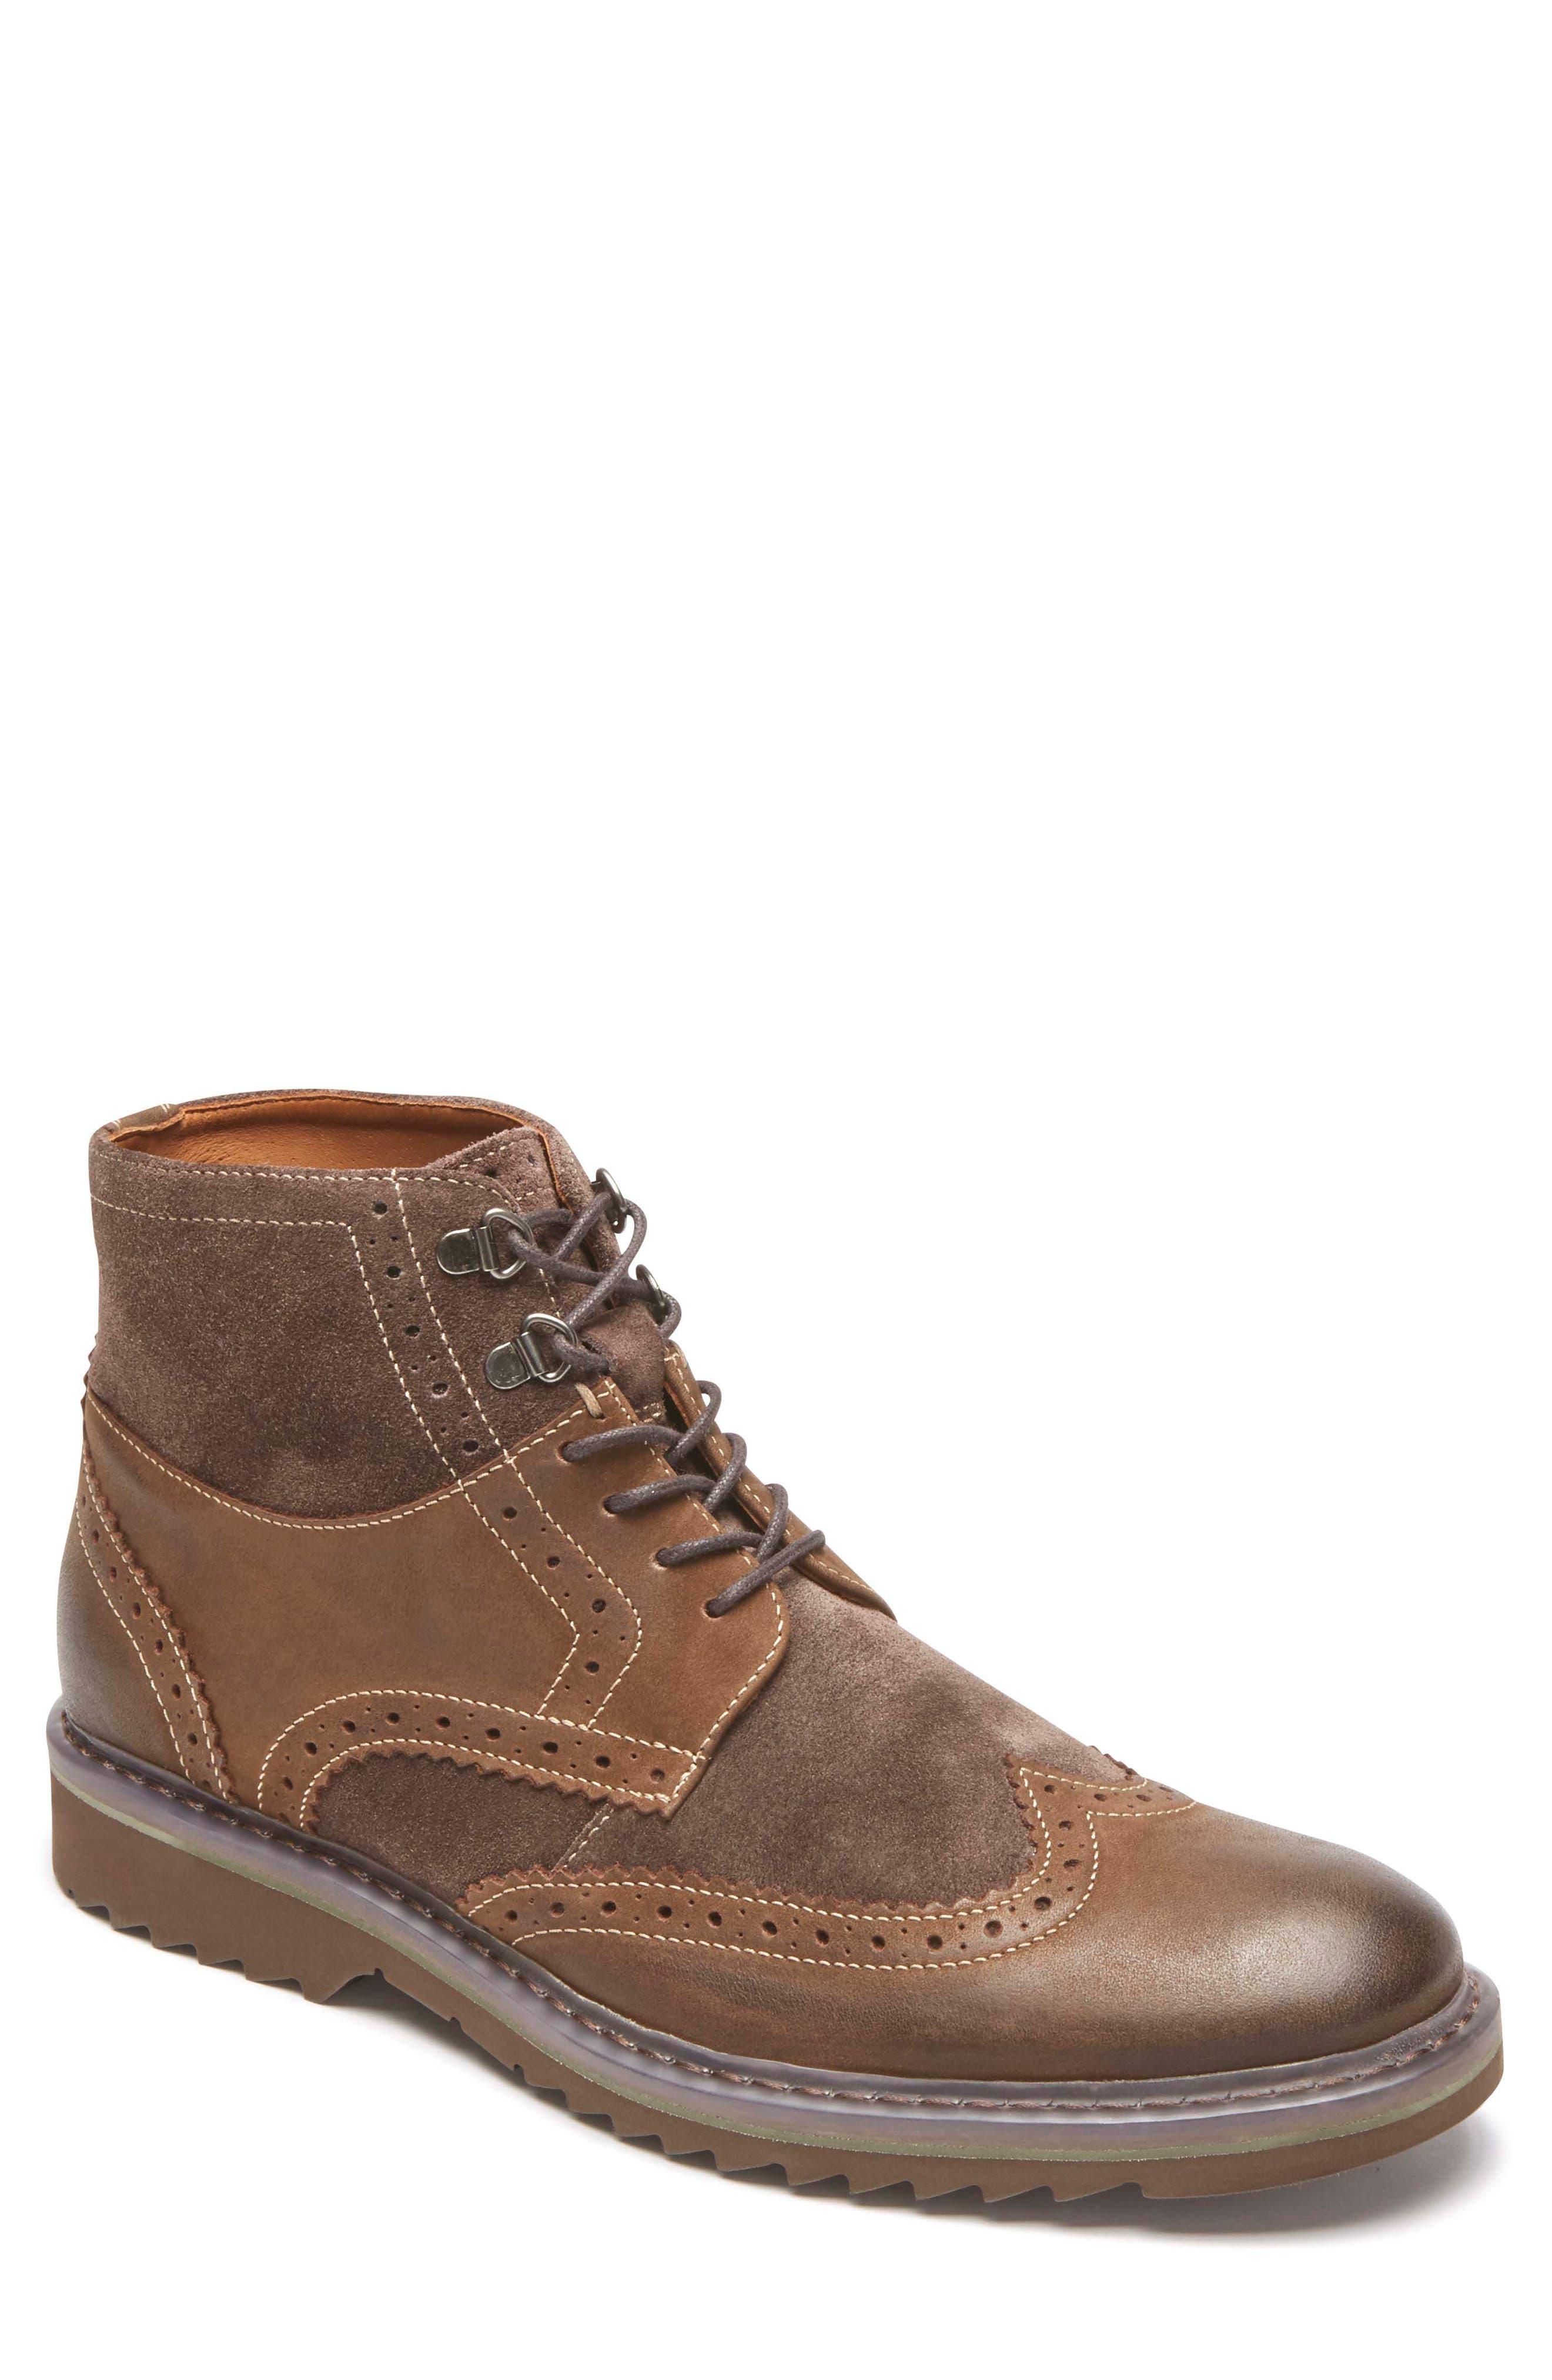 Jaxson Wingtip Boot,                         Main,                         color, BROWN LEATHER